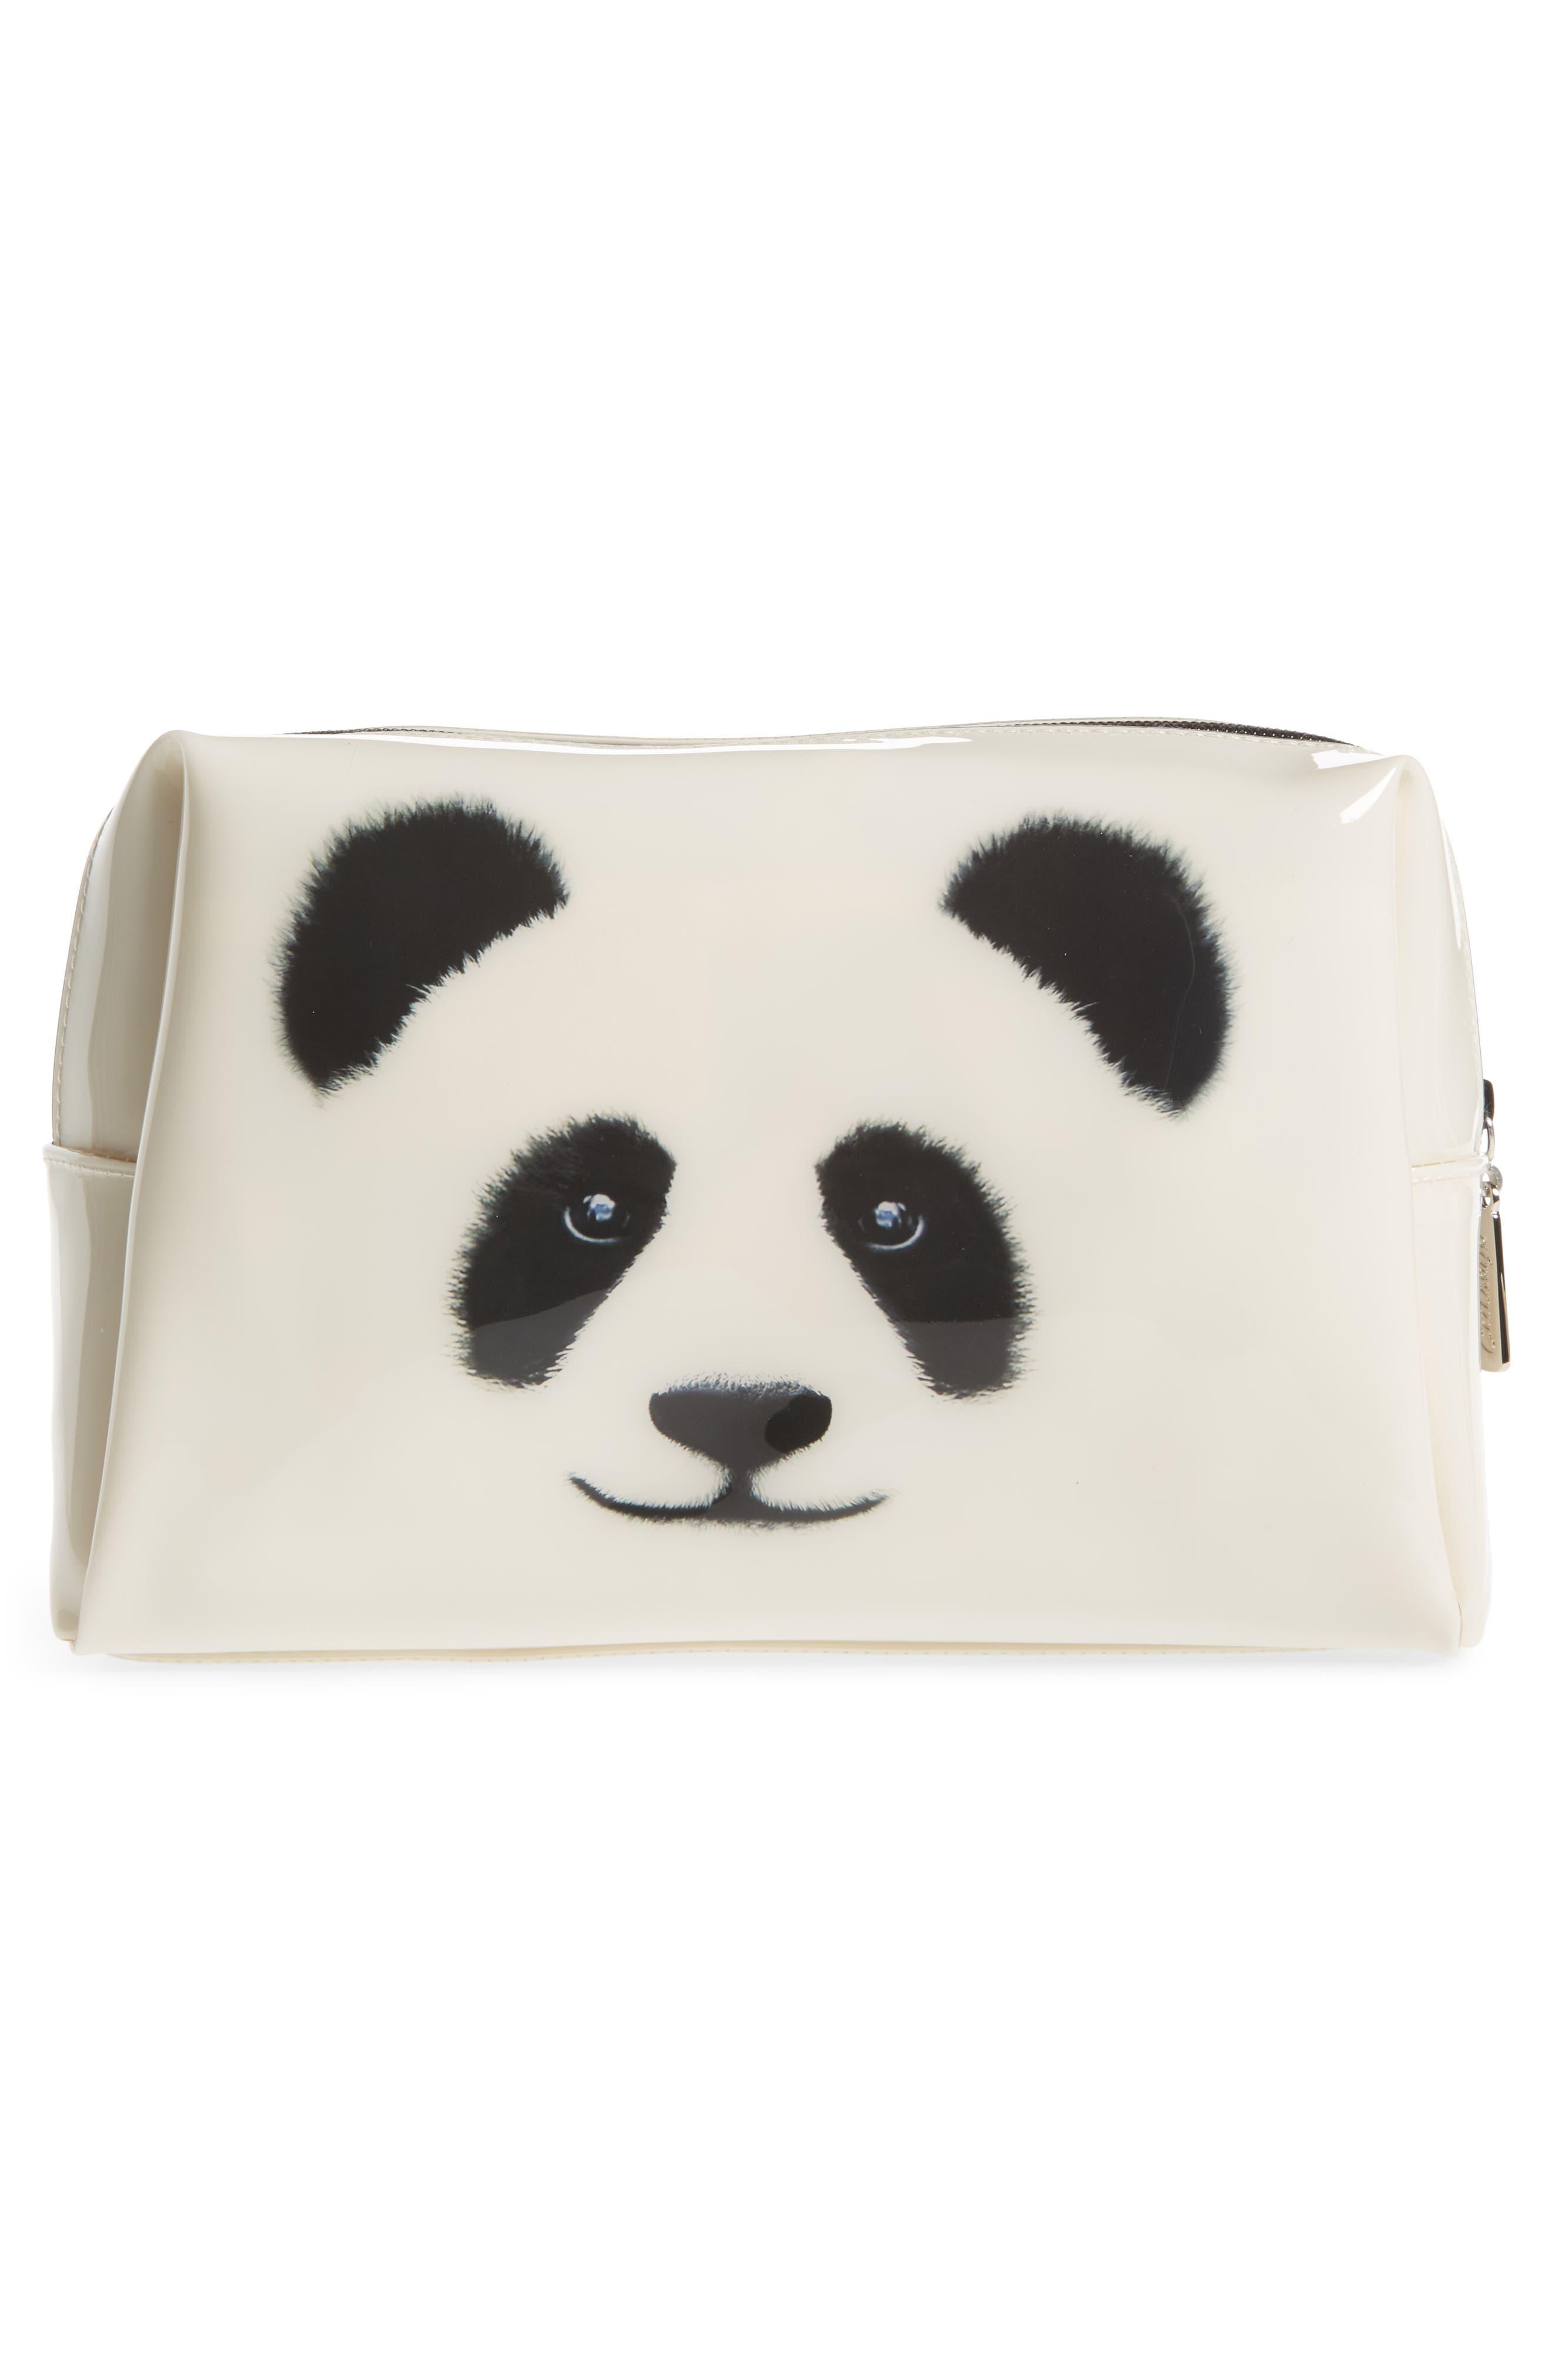 Alternate Image 2  - Catseye London Big Face Panda Large Cosmetics Case